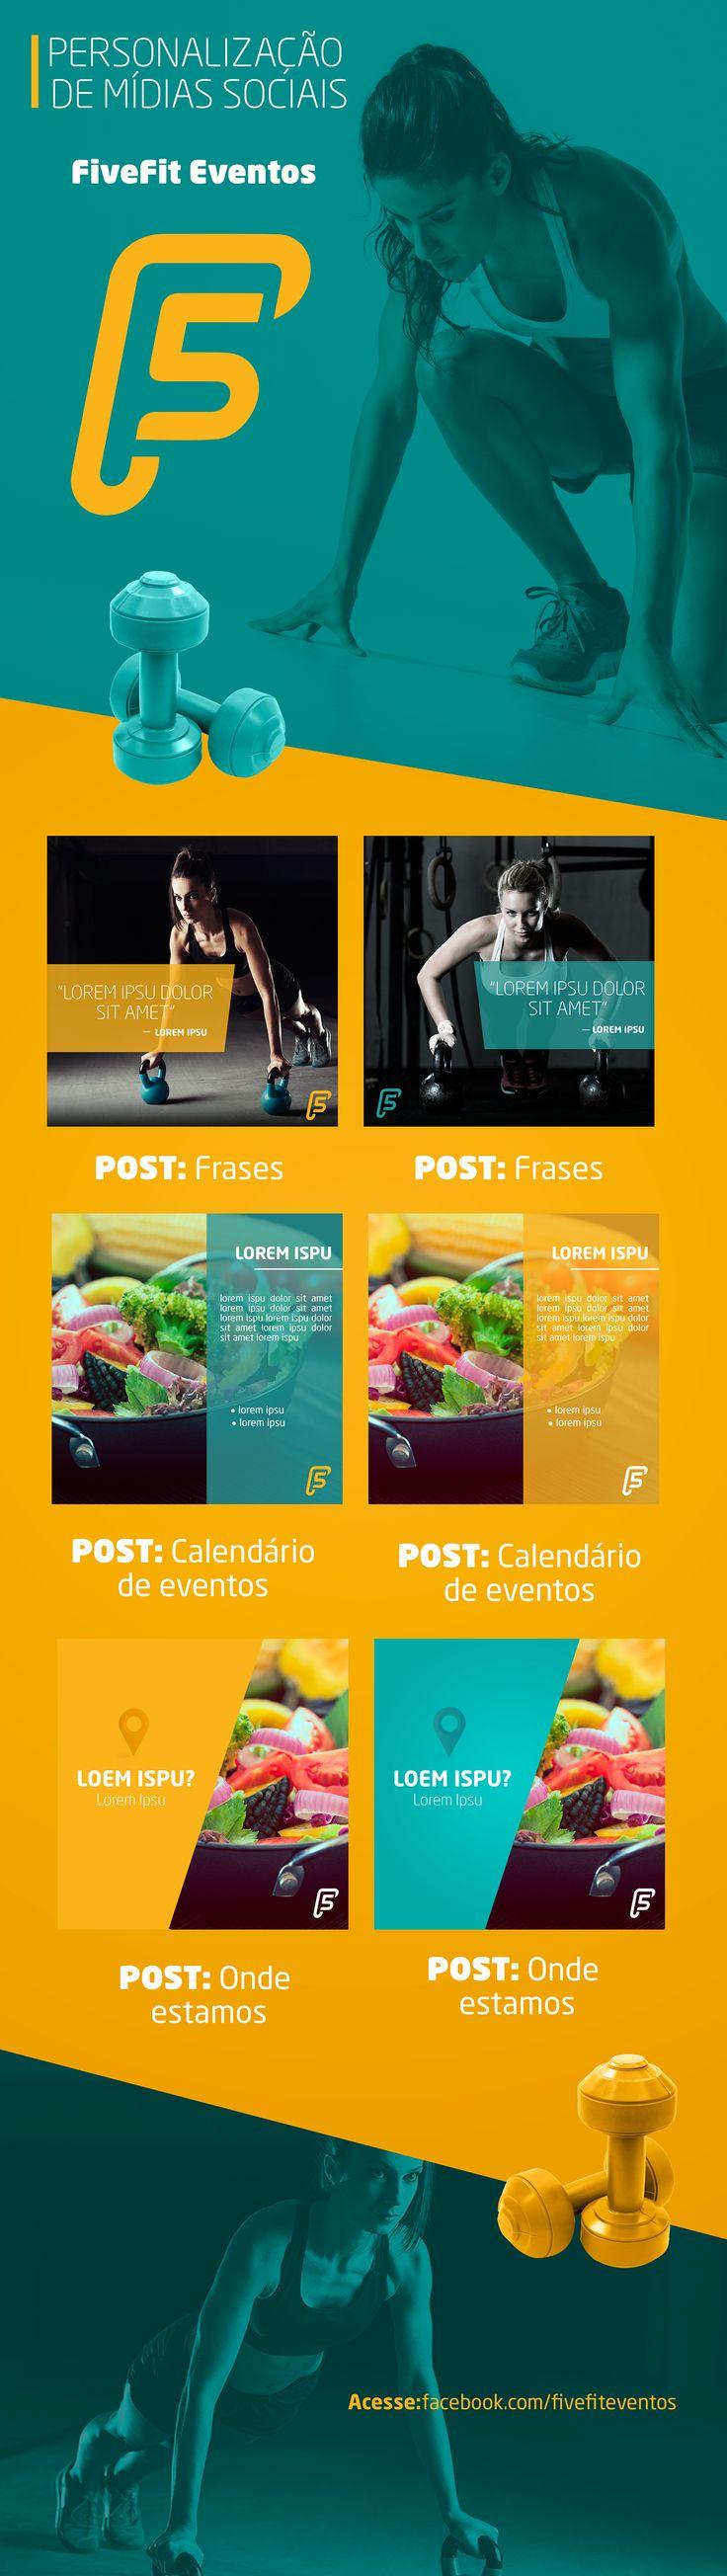 https://www.behance.net/gallery/28903553/FiveFit-Eventos-Personalizacao-de-Midias-Sociais